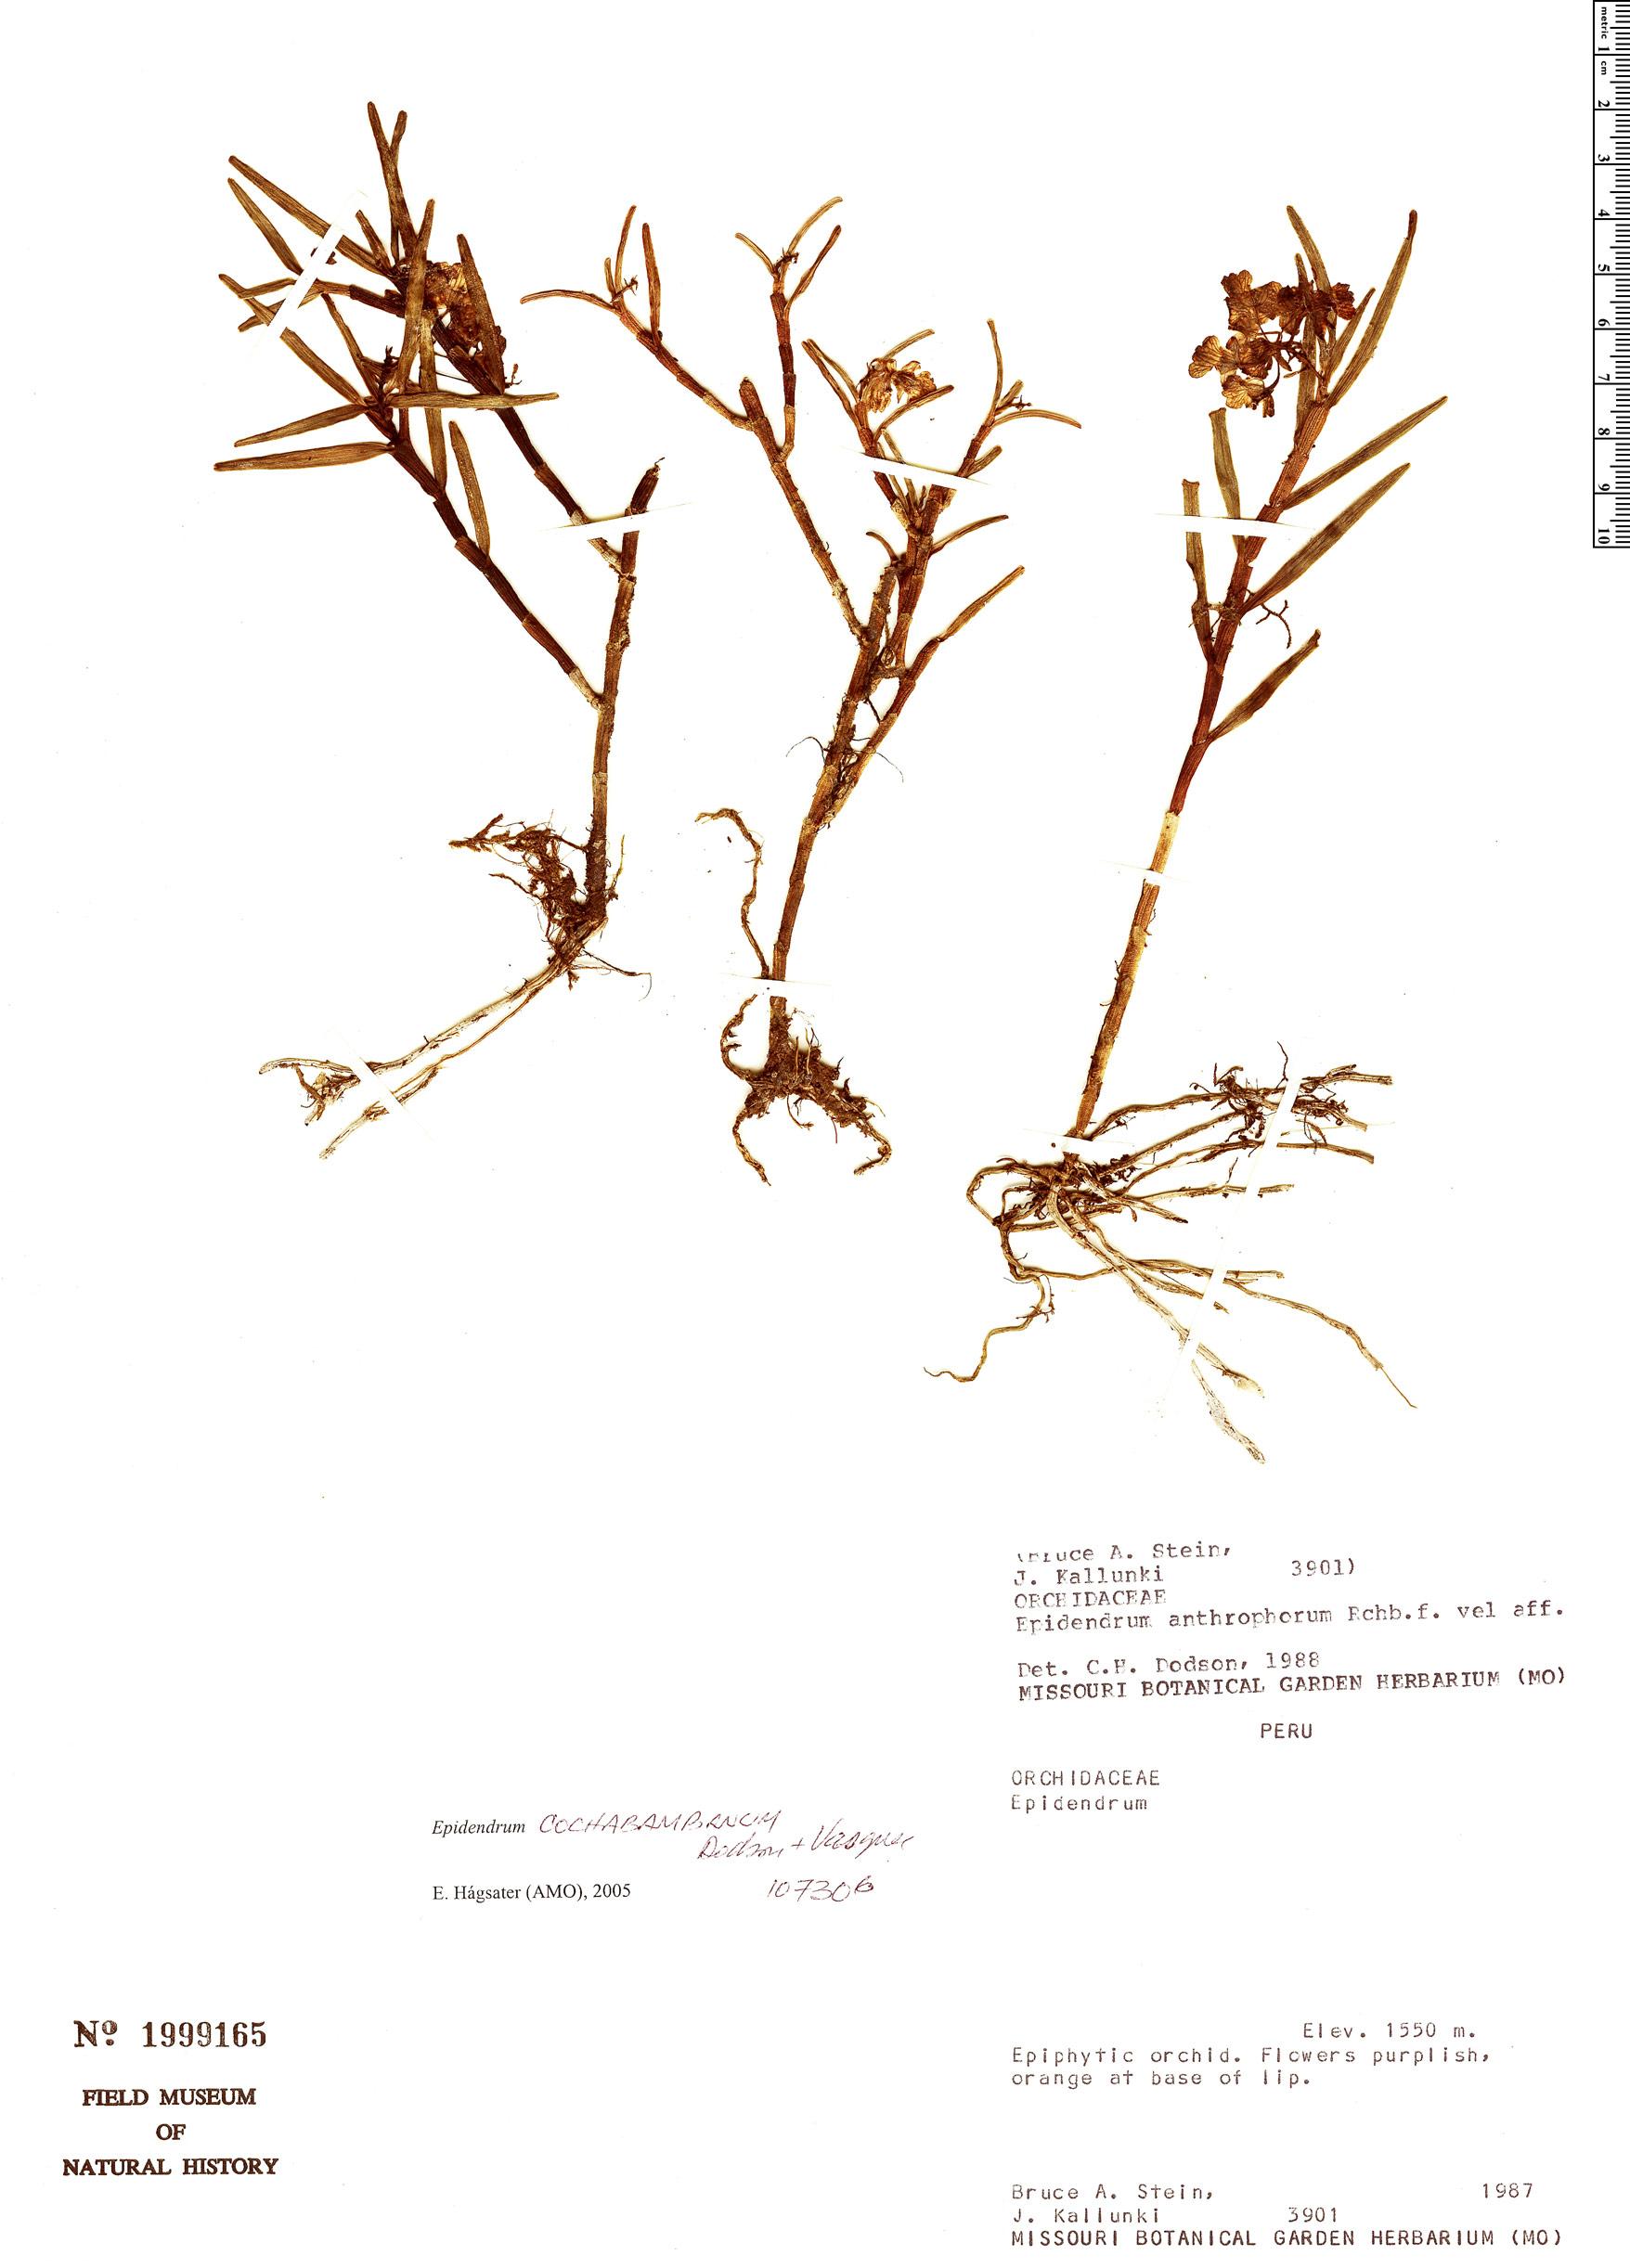 Specimen: Epidendrum cochabambanum